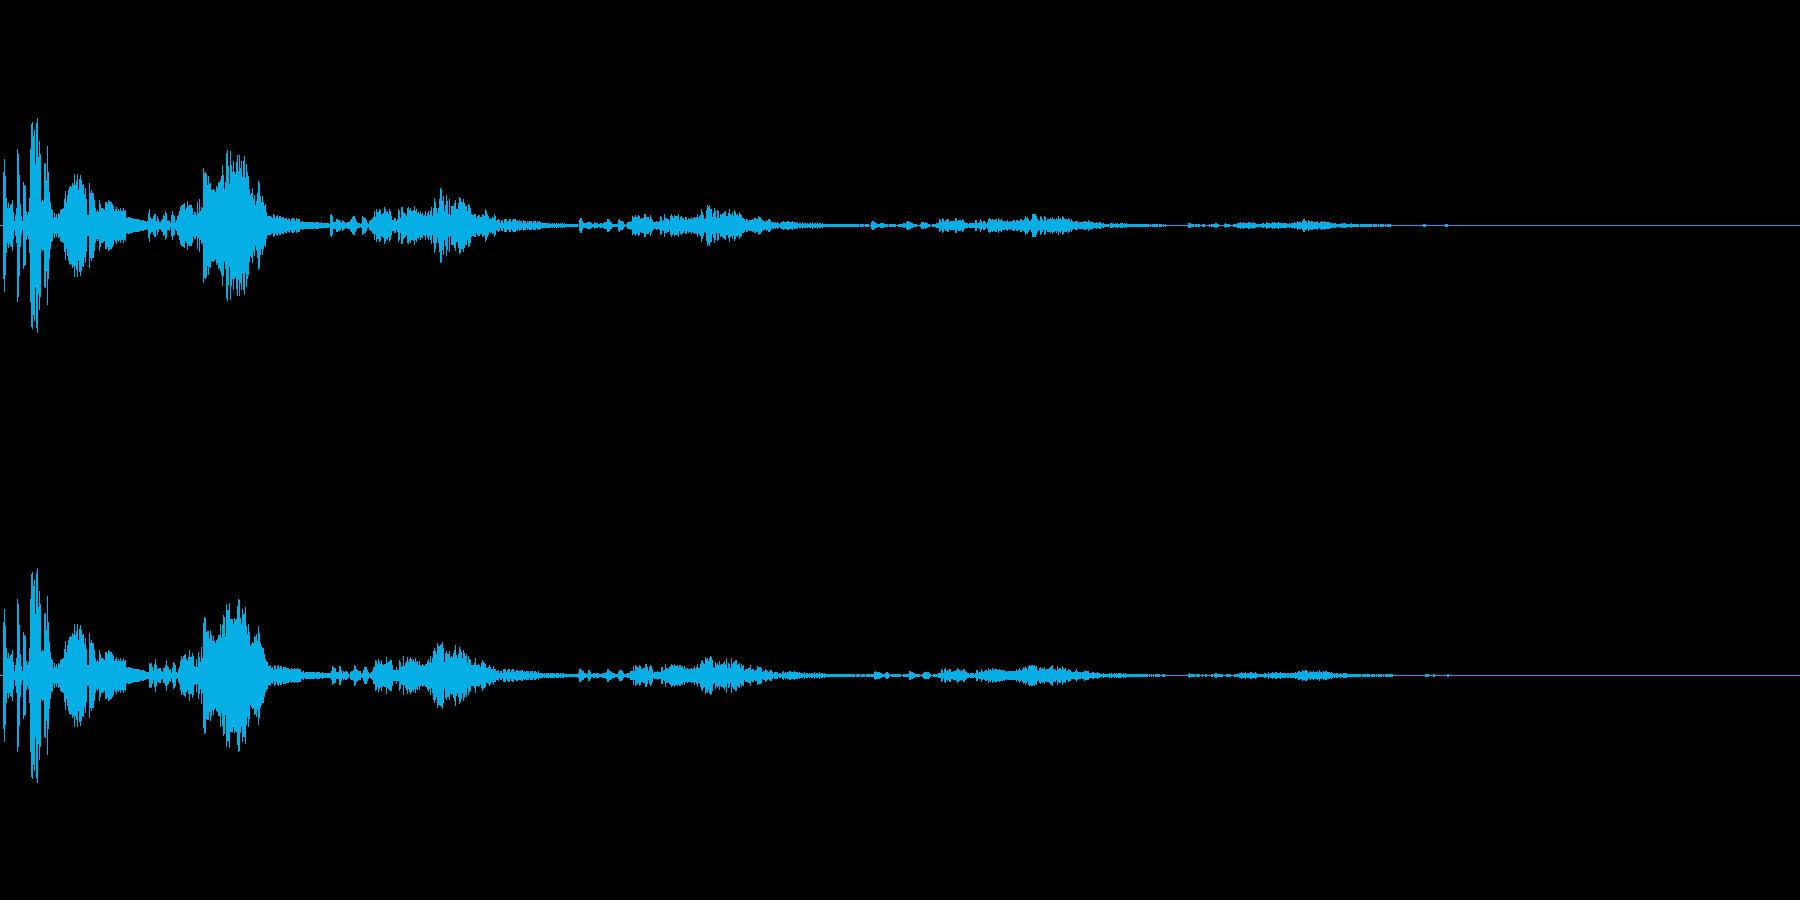 【SE 効果音】不気味な音3の再生済みの波形